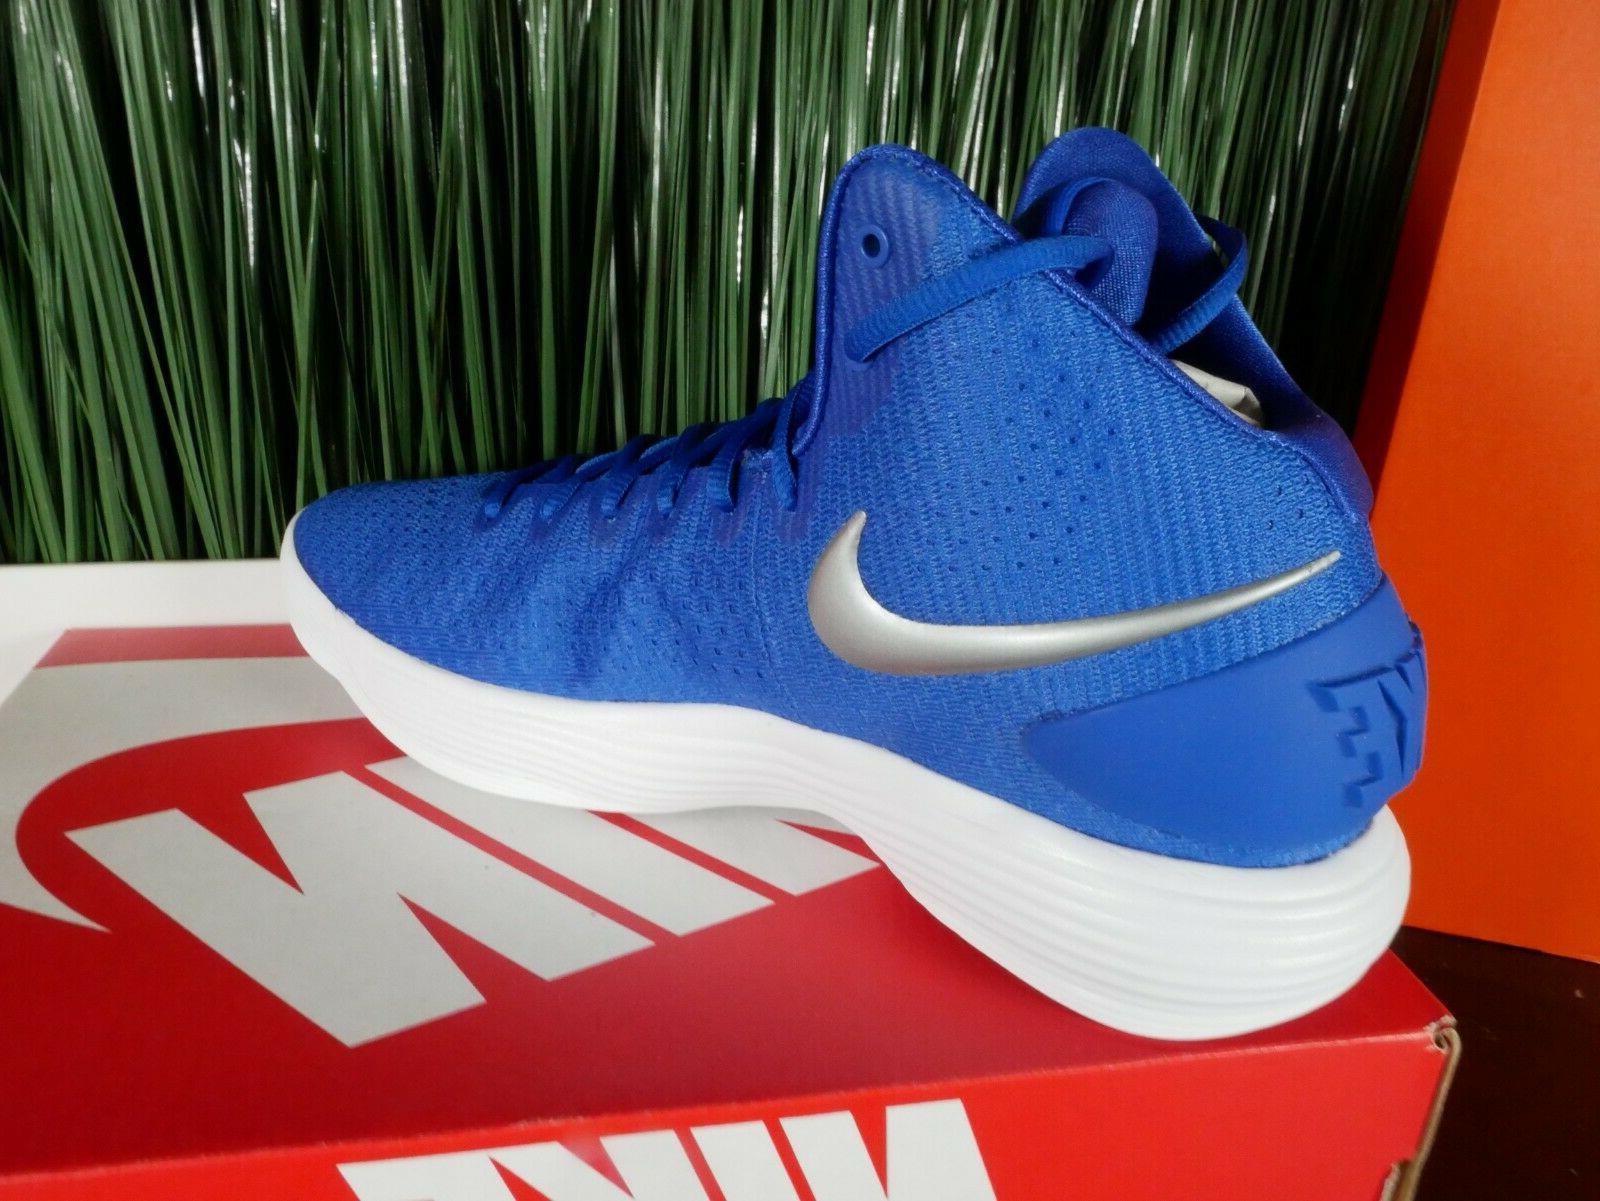 Nike Hyperdunk Basketball Shoes Game Blue Multi